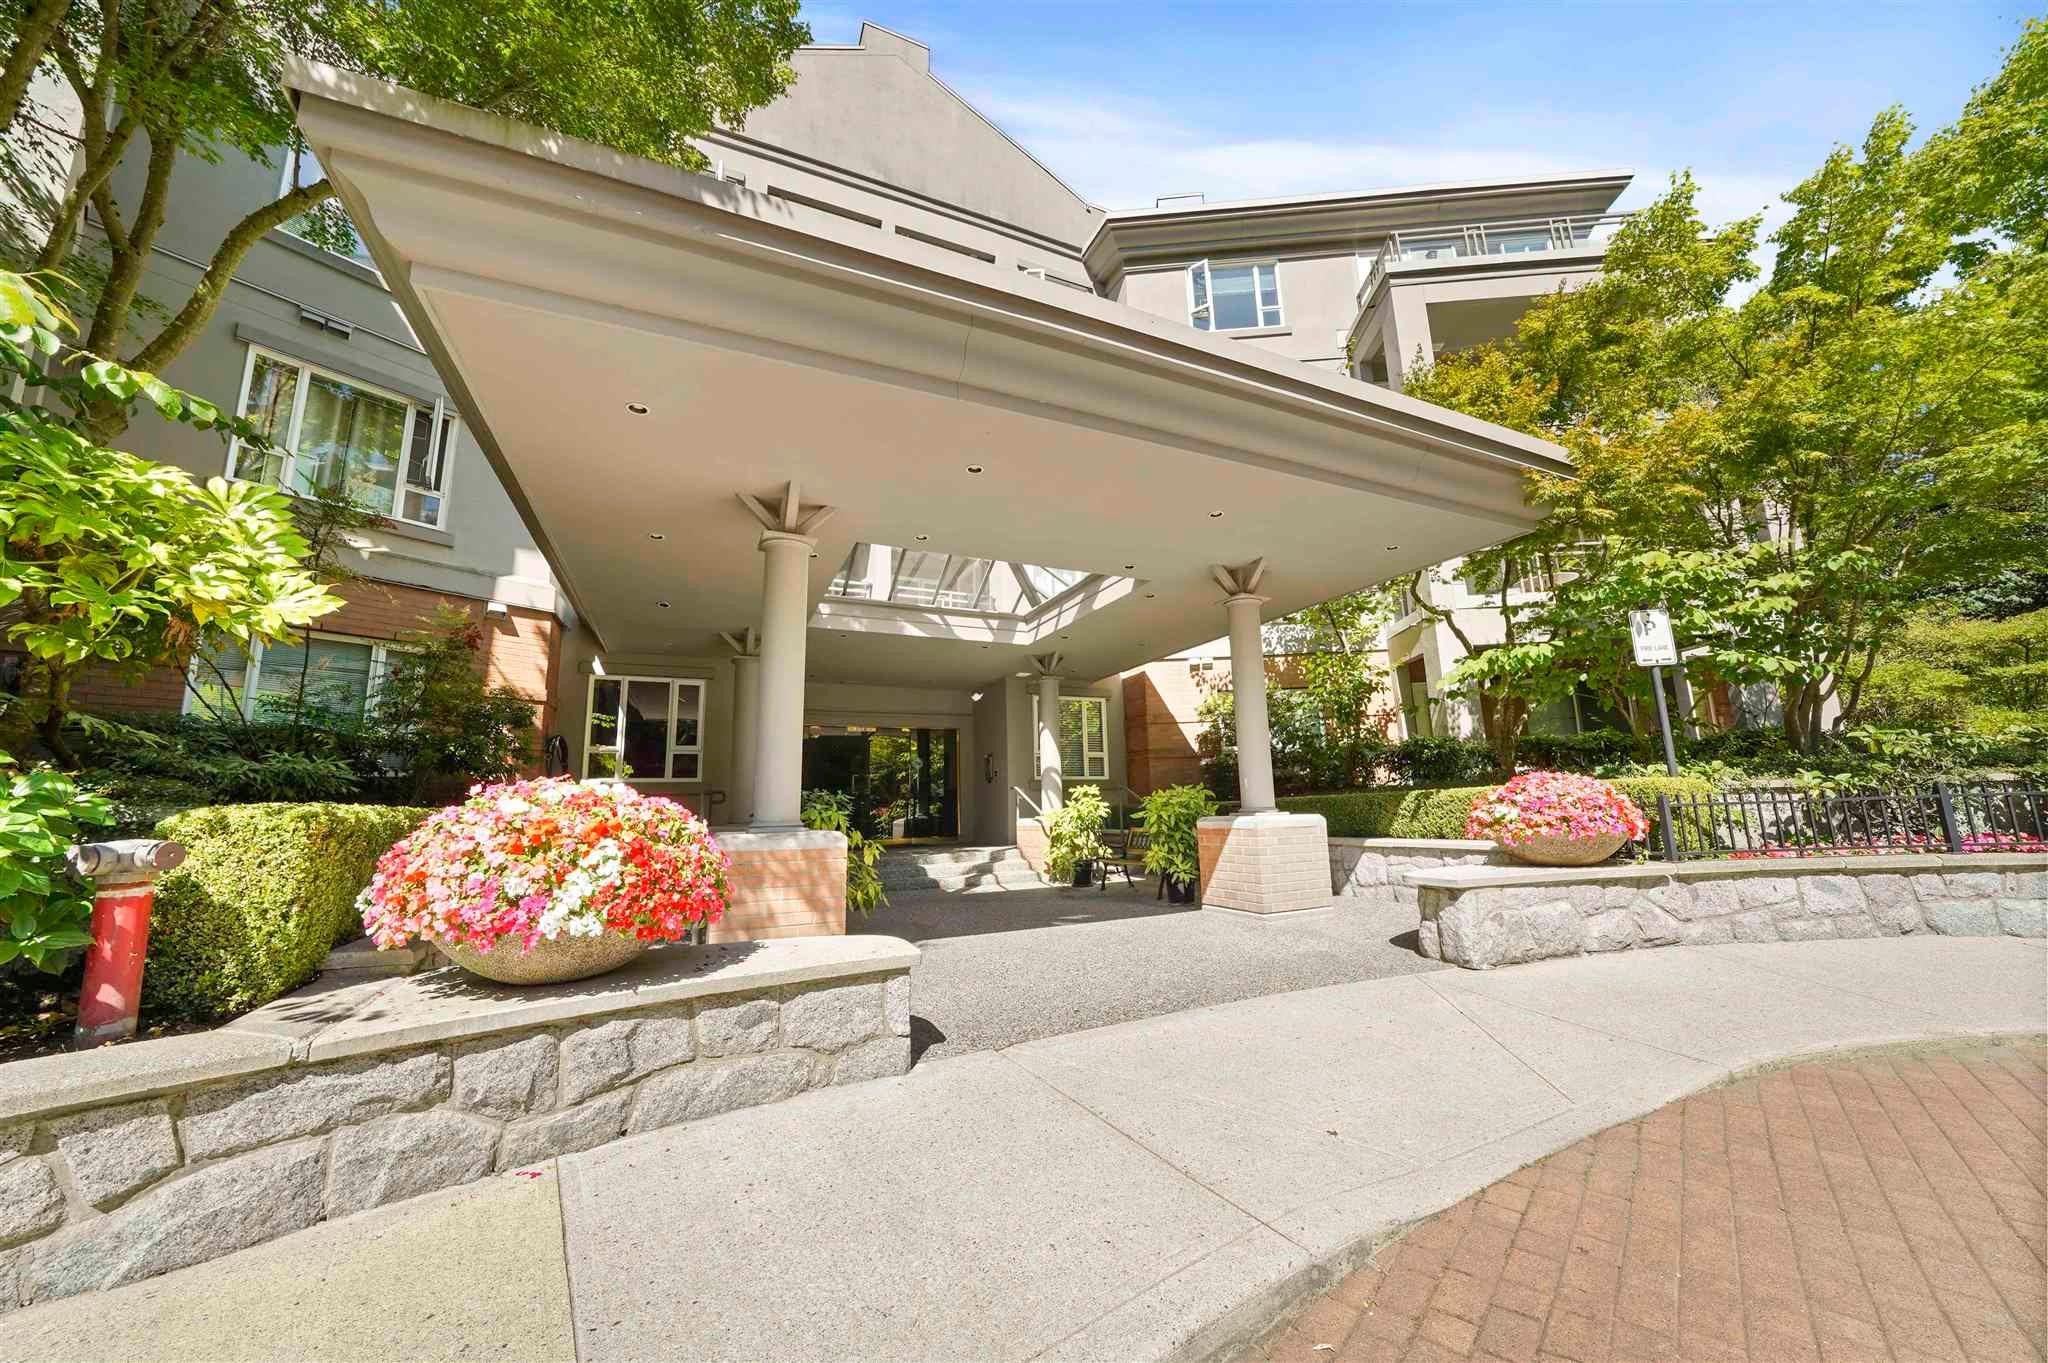 412 5683 HAMPTON PLACE - University VW Apartment/Condo for sale, 2 Bedrooms (R2605599) - #1